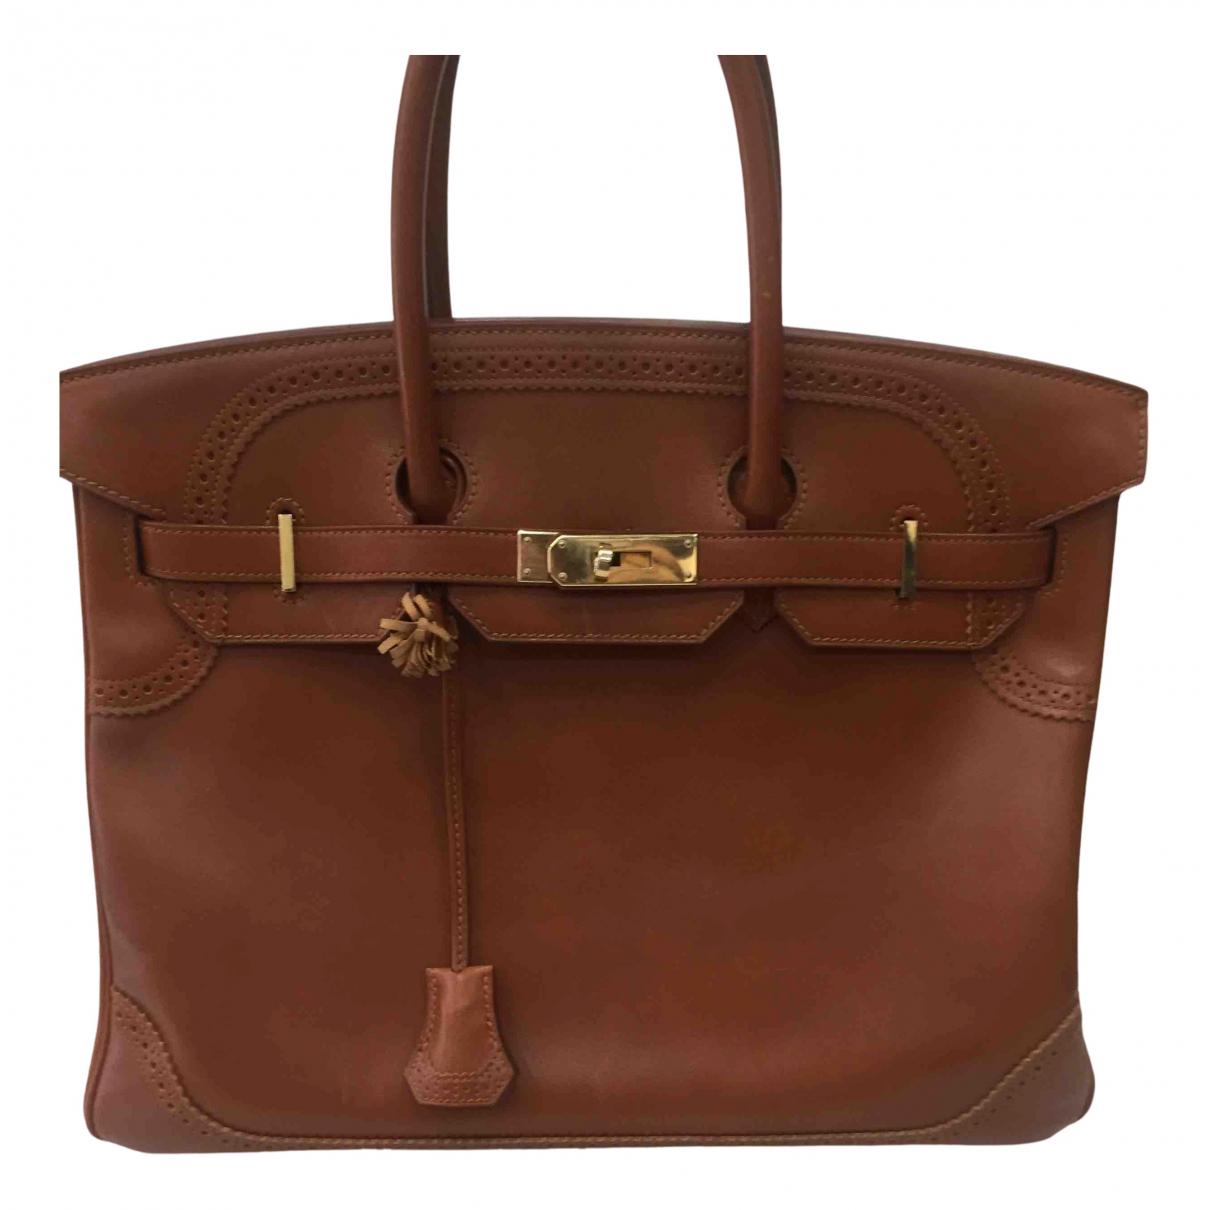 Hermes Birkin 35 Handtasche in  Kamel Leder